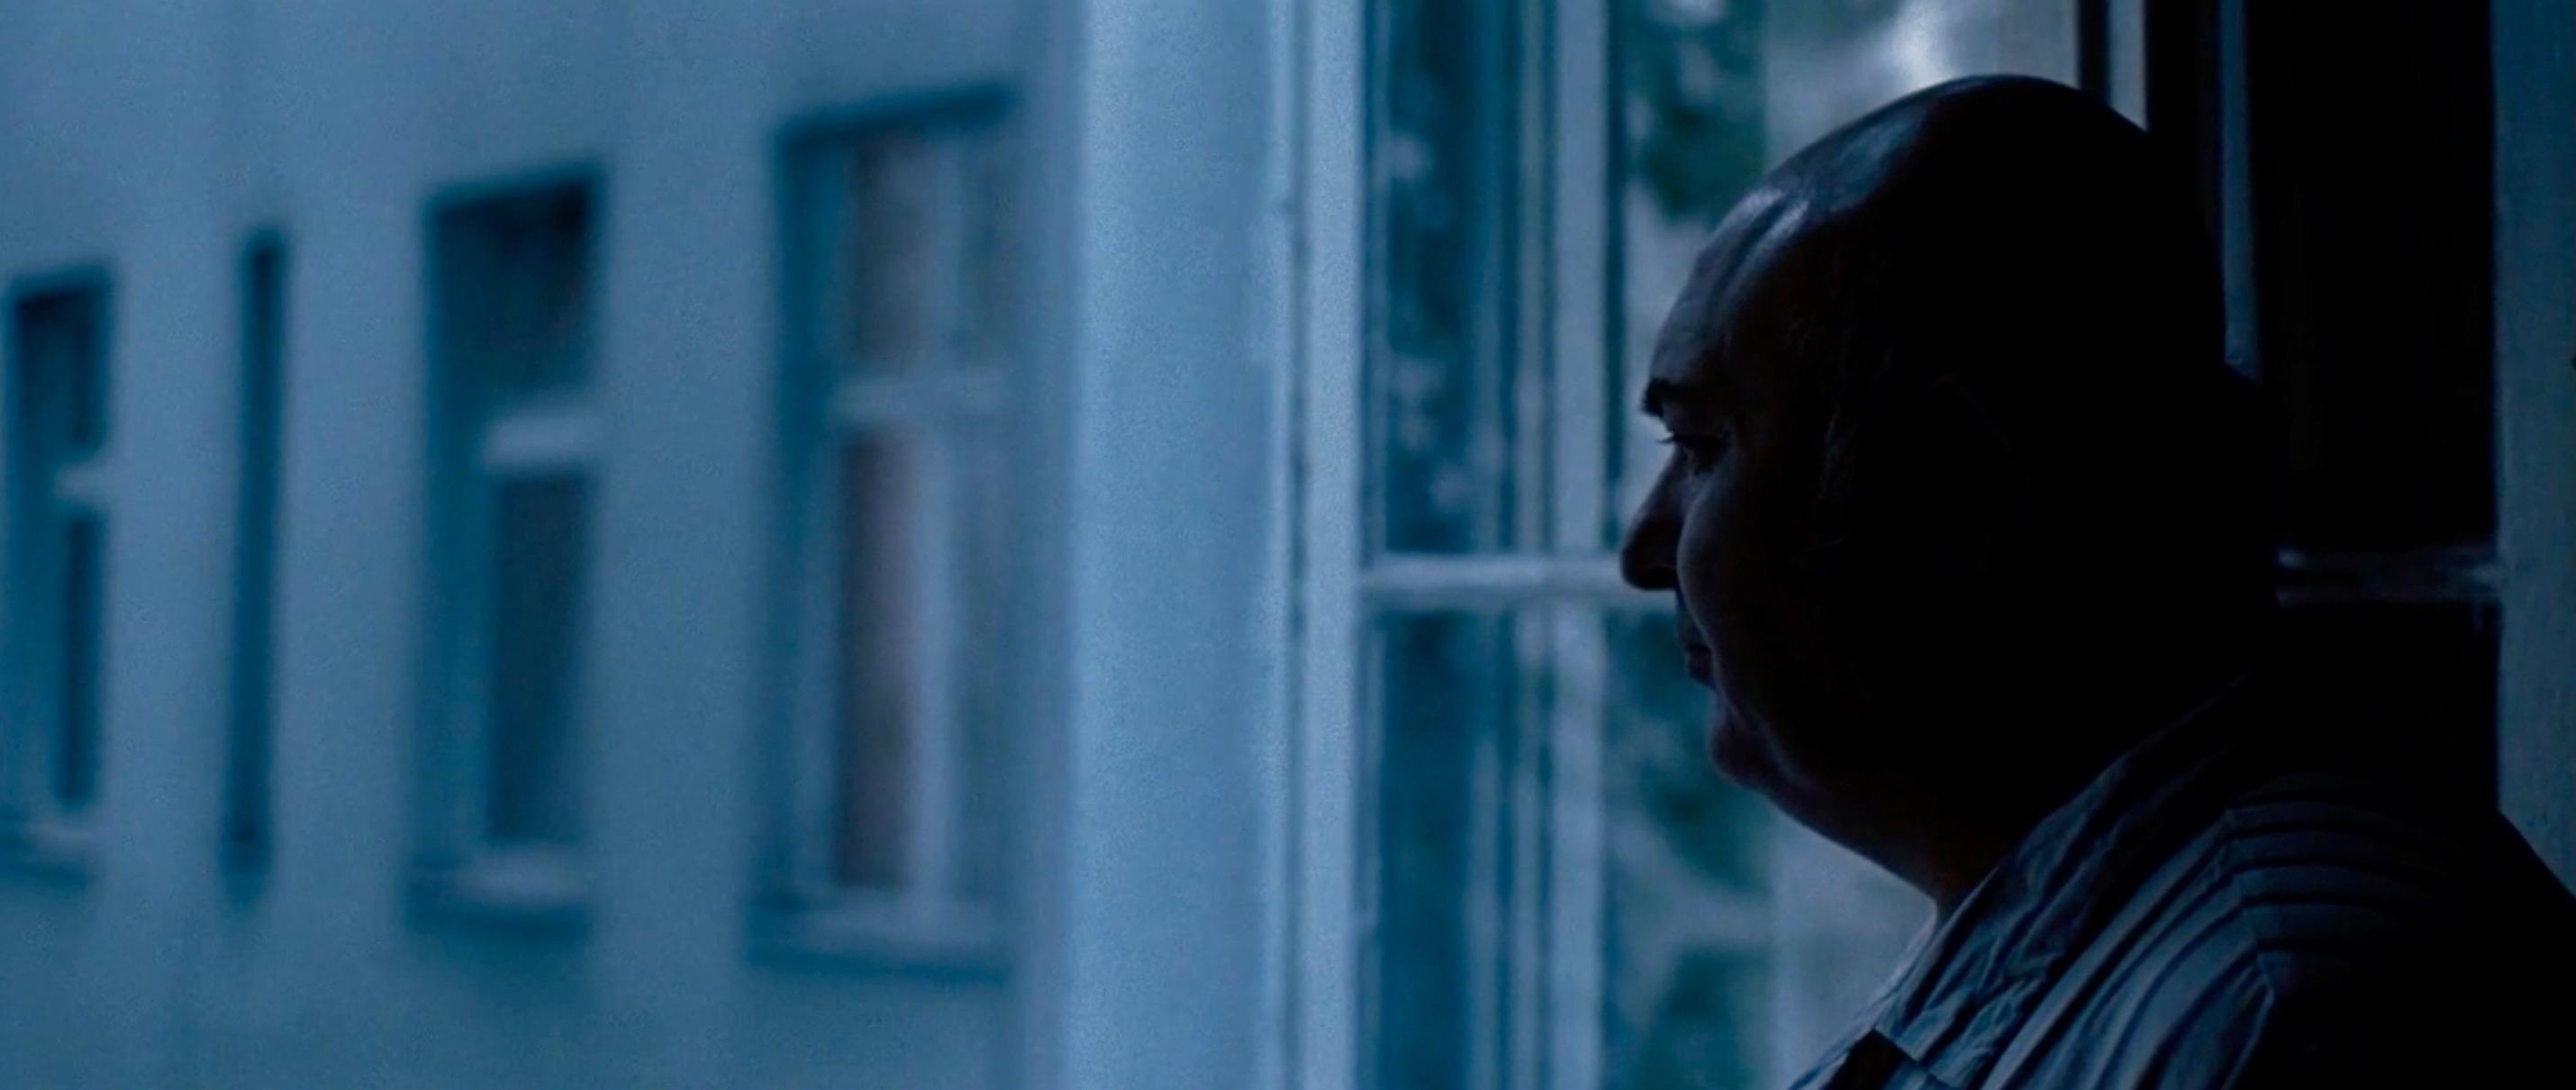 Die Fremde - Settar Tanrıöğen spielt Umays Vater Kader - Regie: Feo Aladag - Kamera Judith Kaufmann